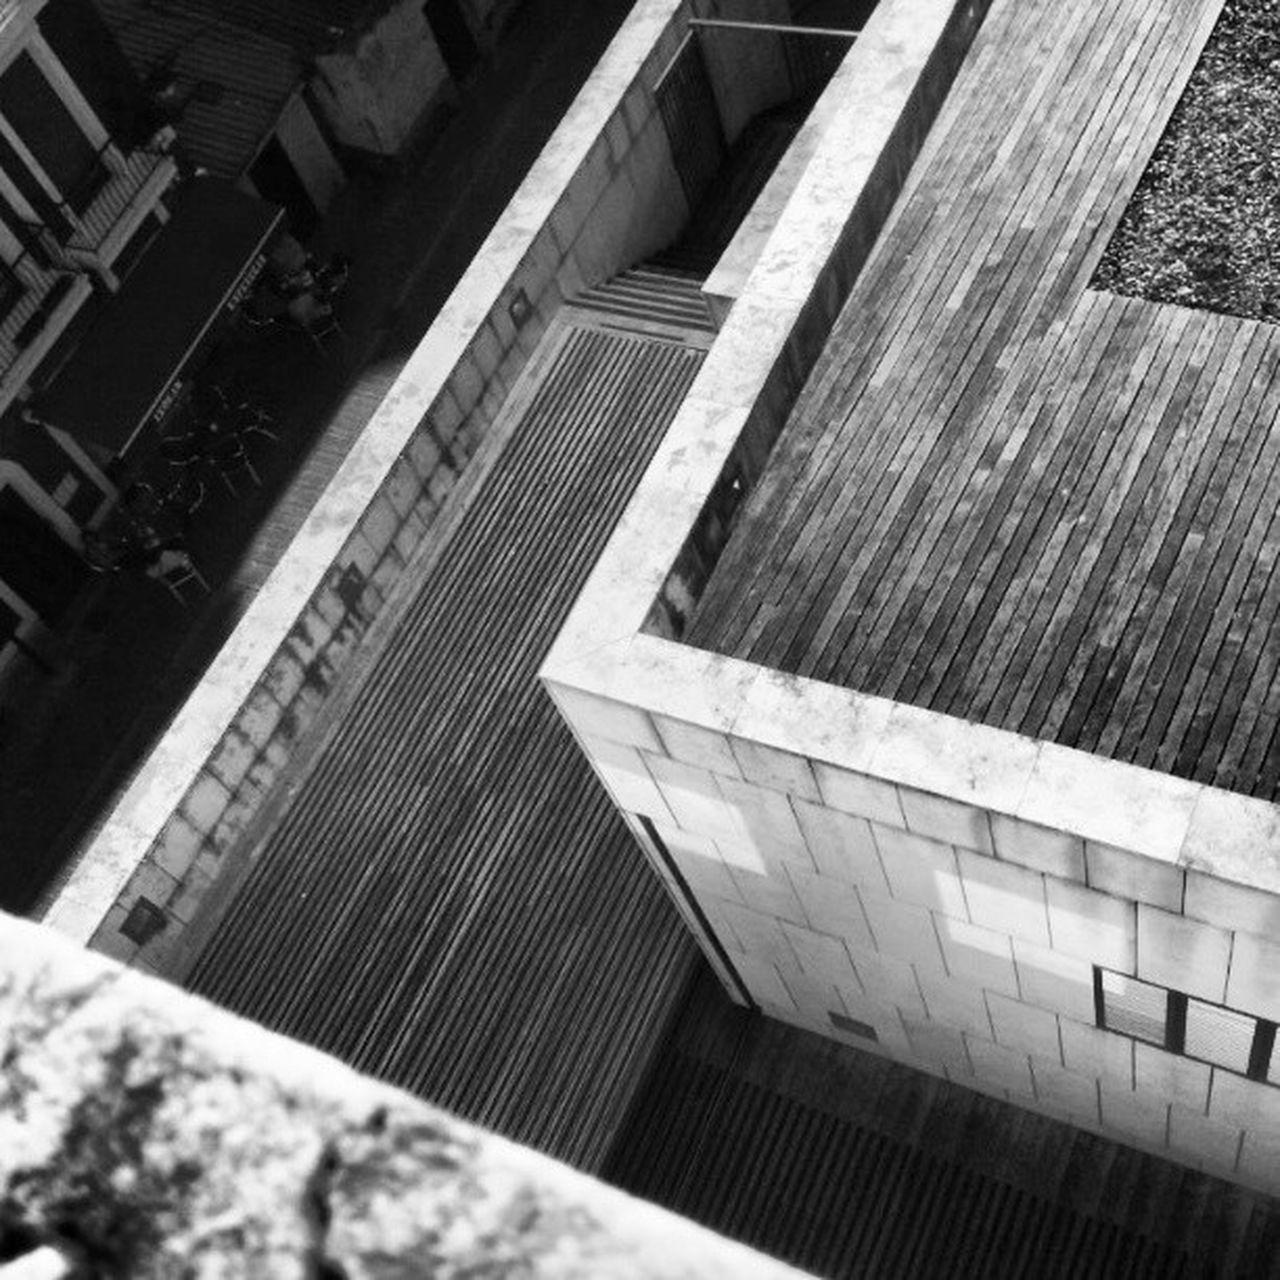 Blancoynegro Blackandwhite Edificio Building Picado Cenital